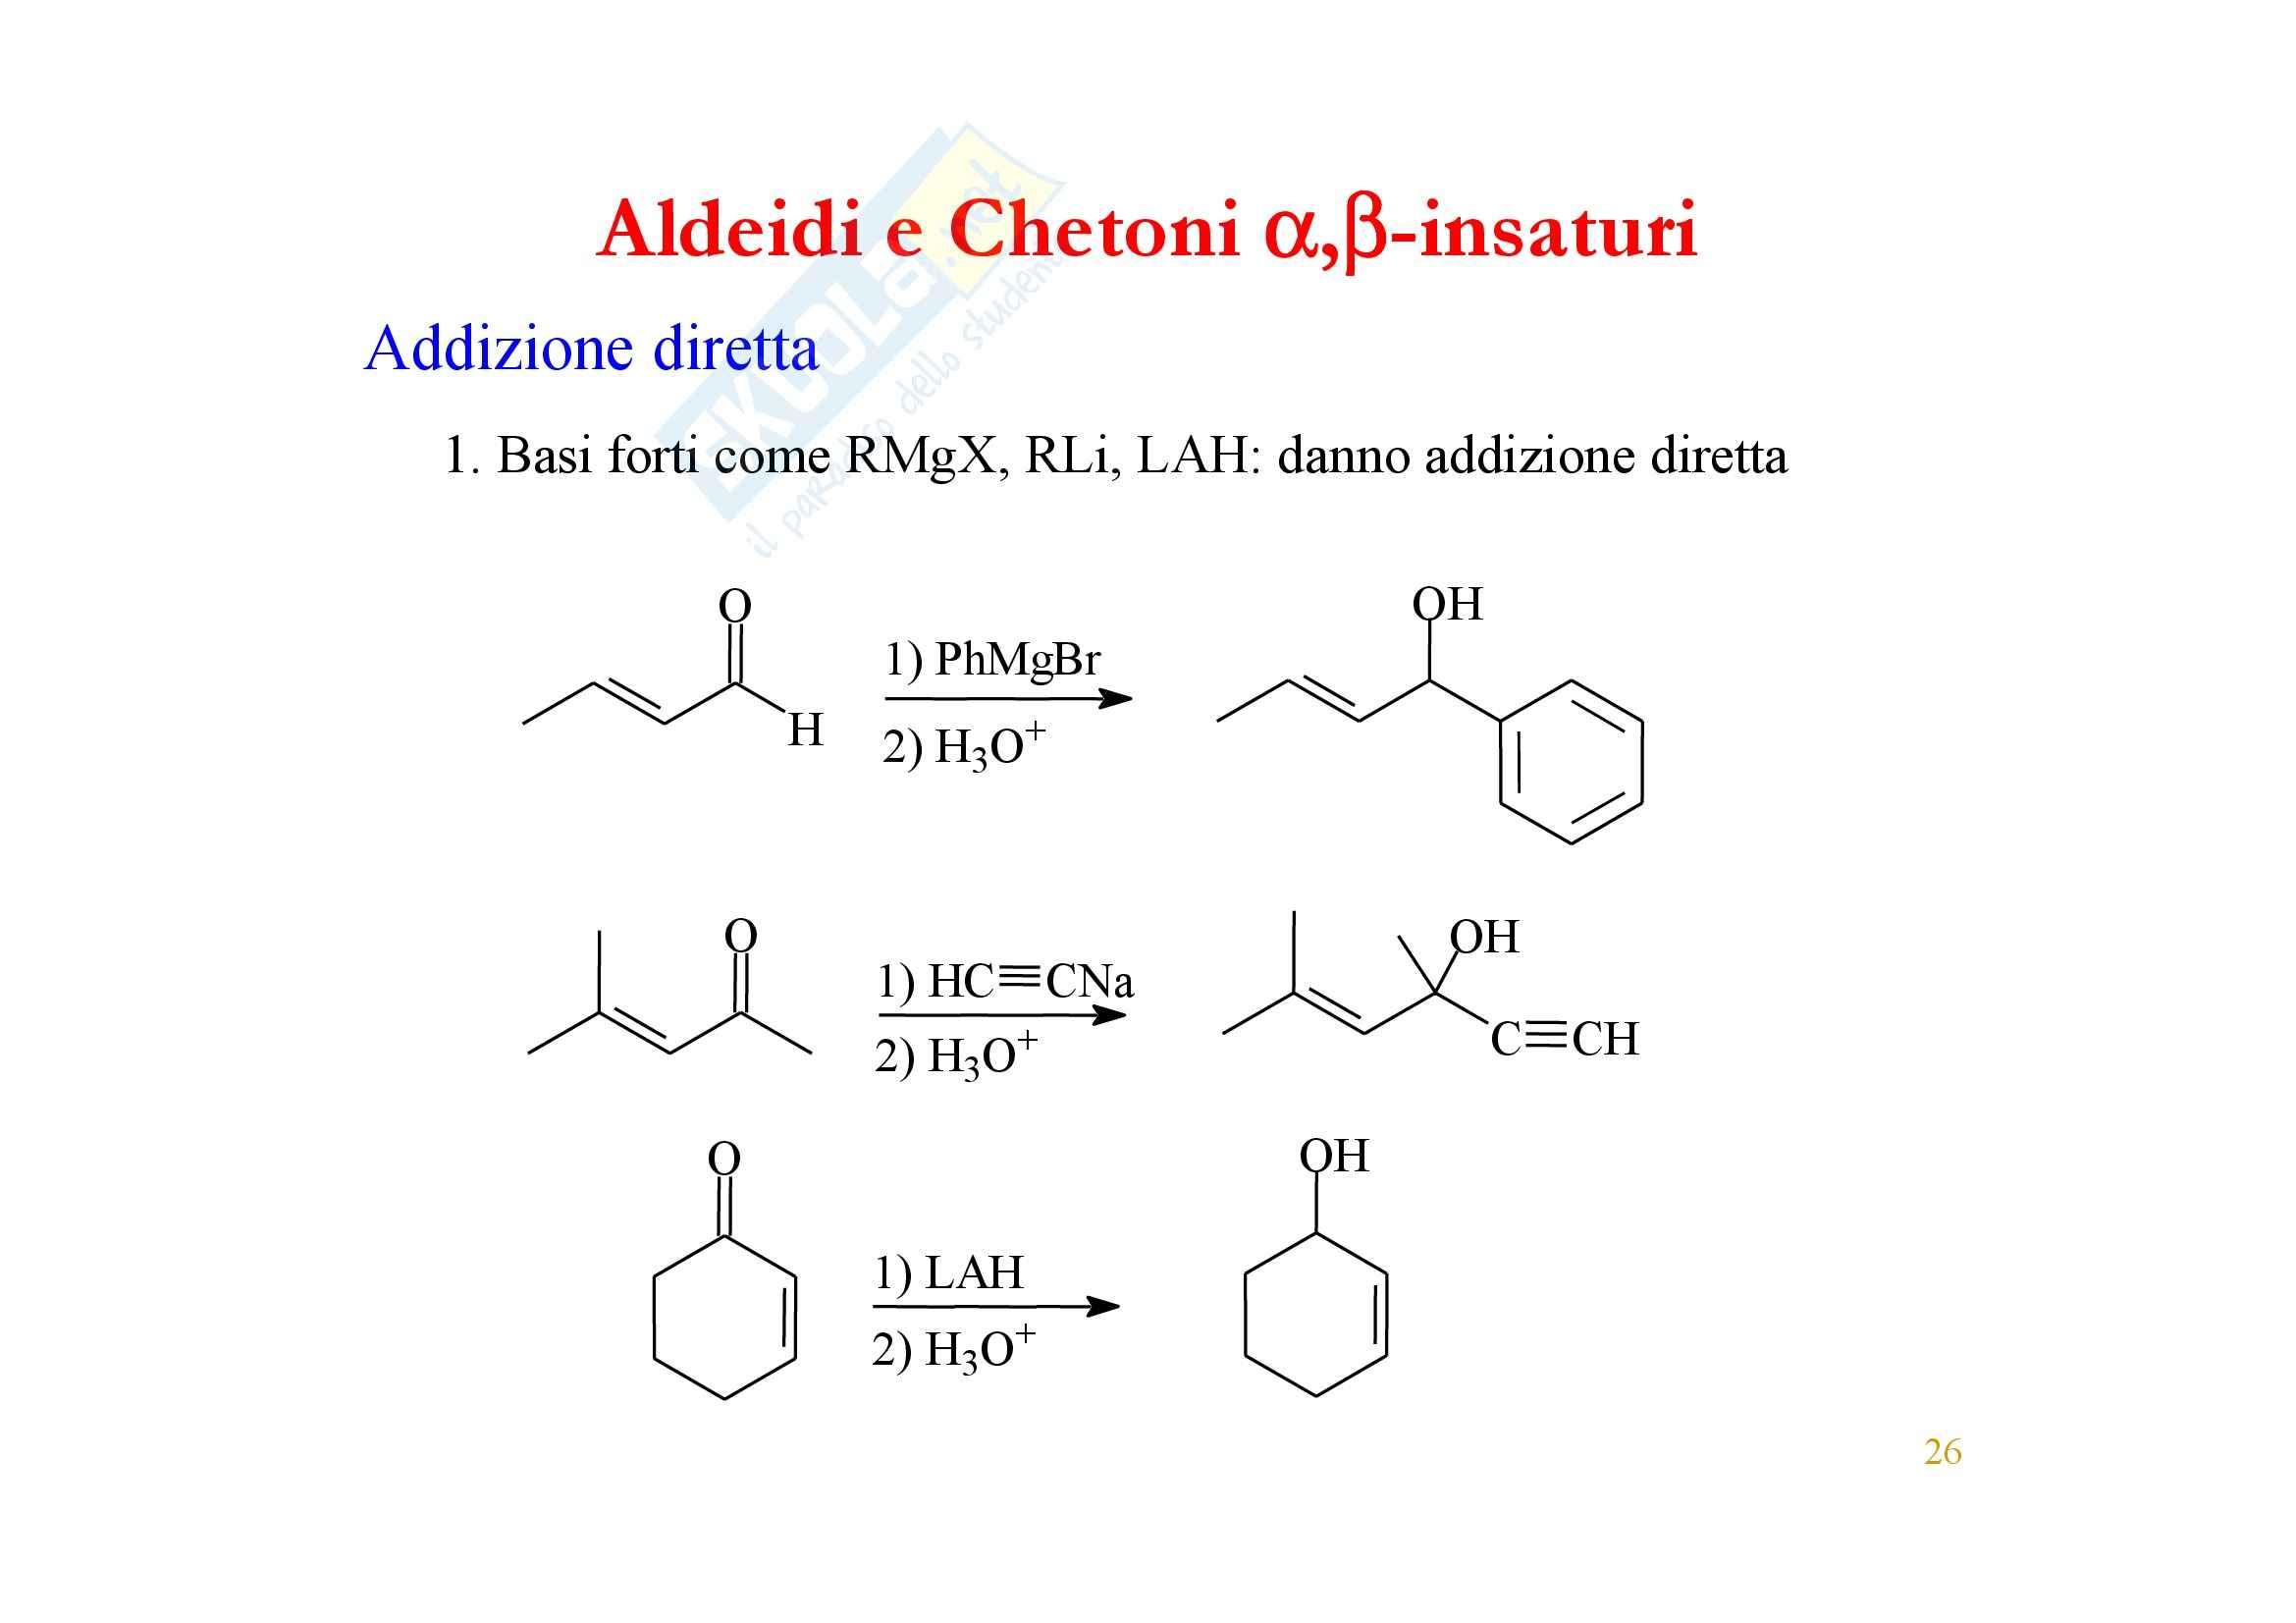 Chimica organica - enoli ed enolati Pag. 26